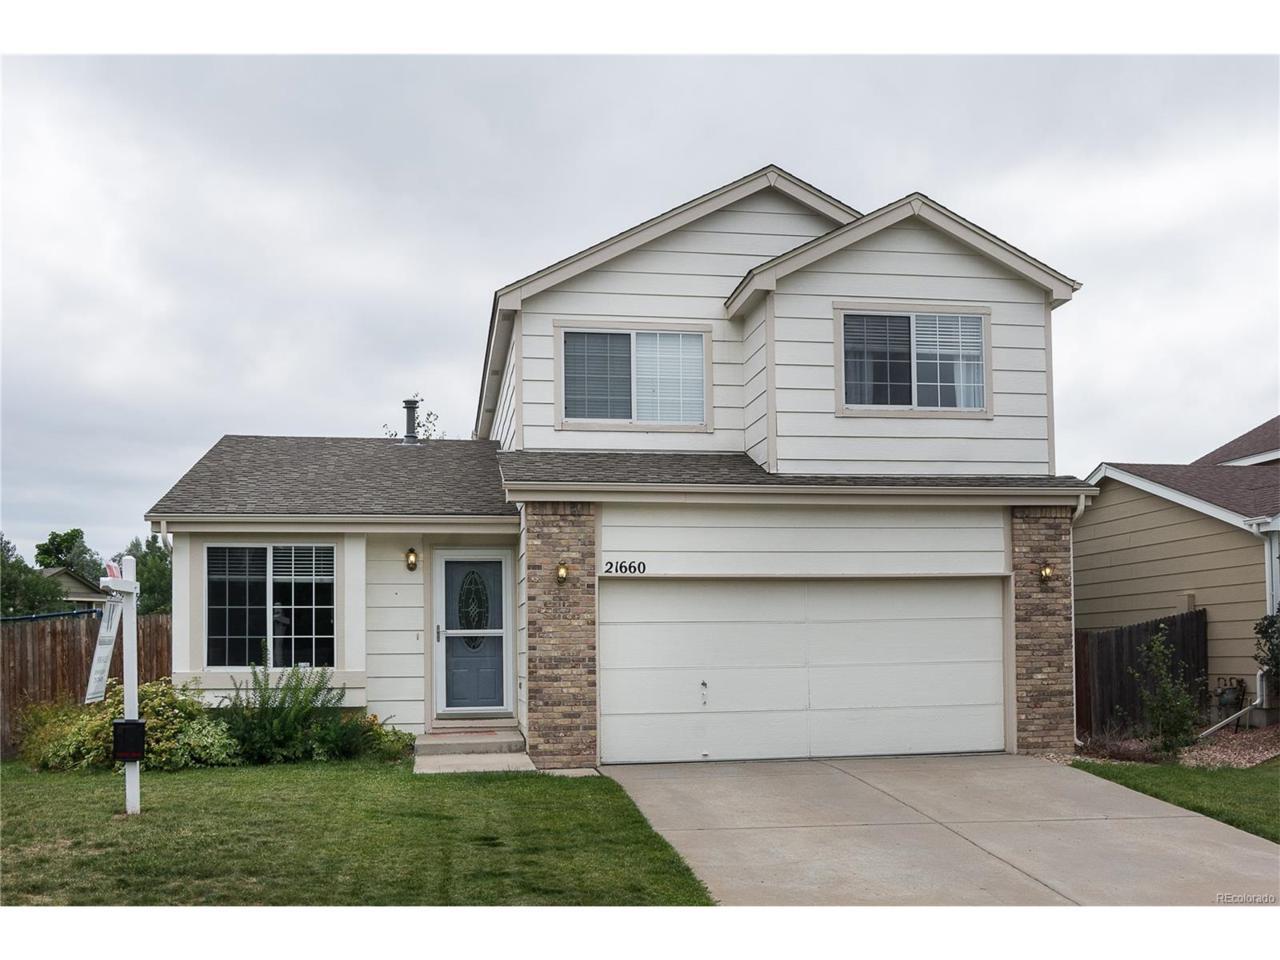 21660 E Crestline Lane, Centennial, CO 80015 (MLS #2947643) :: 8z Real Estate